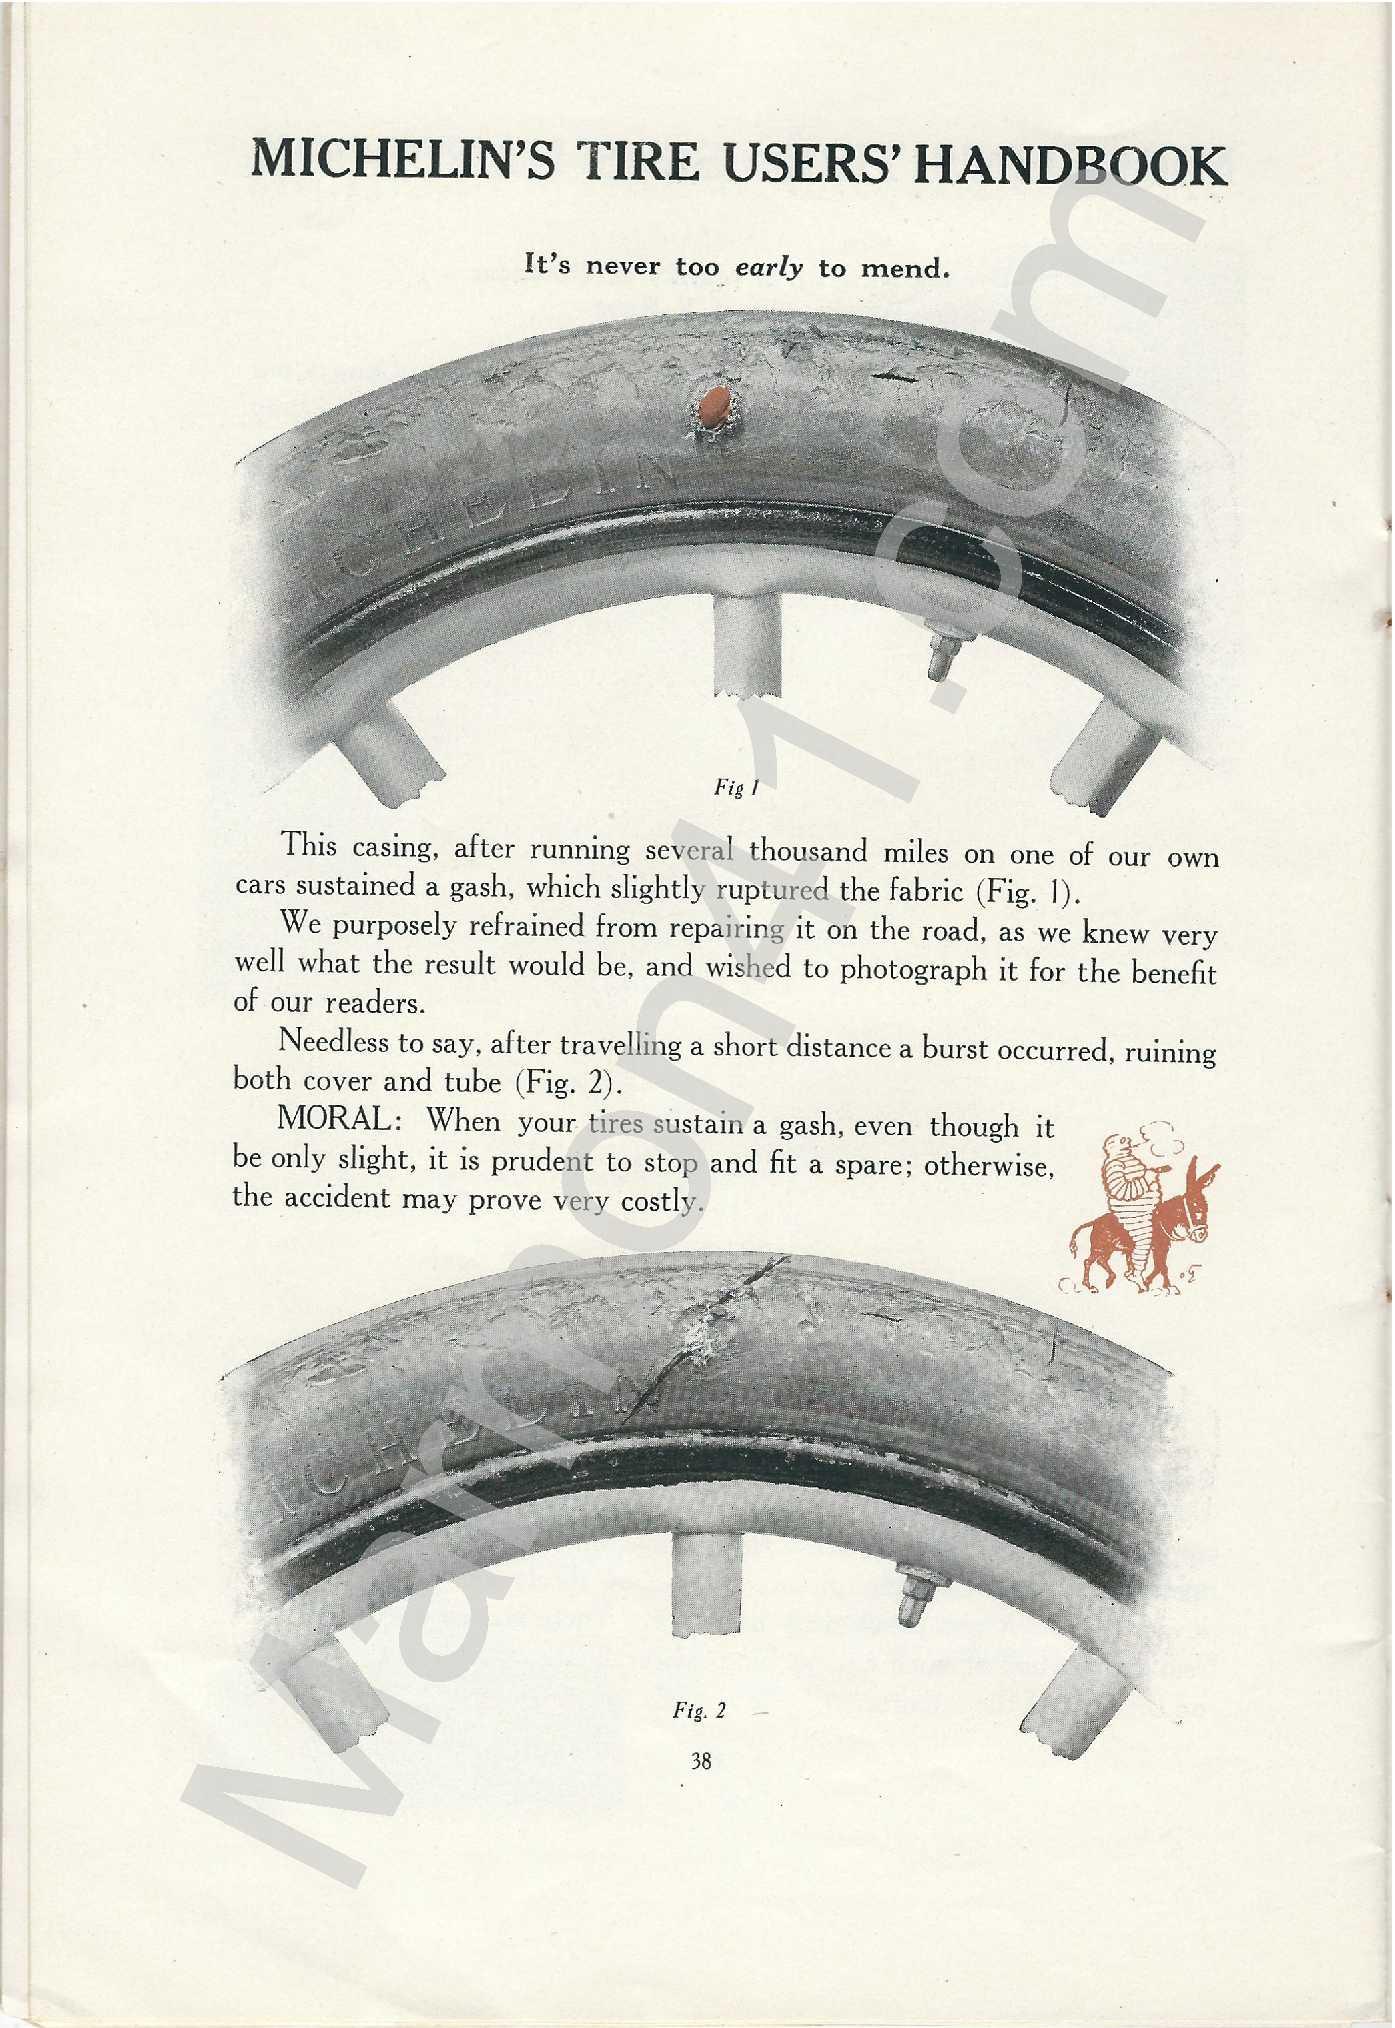 Michelins Tire Users Handbook_38